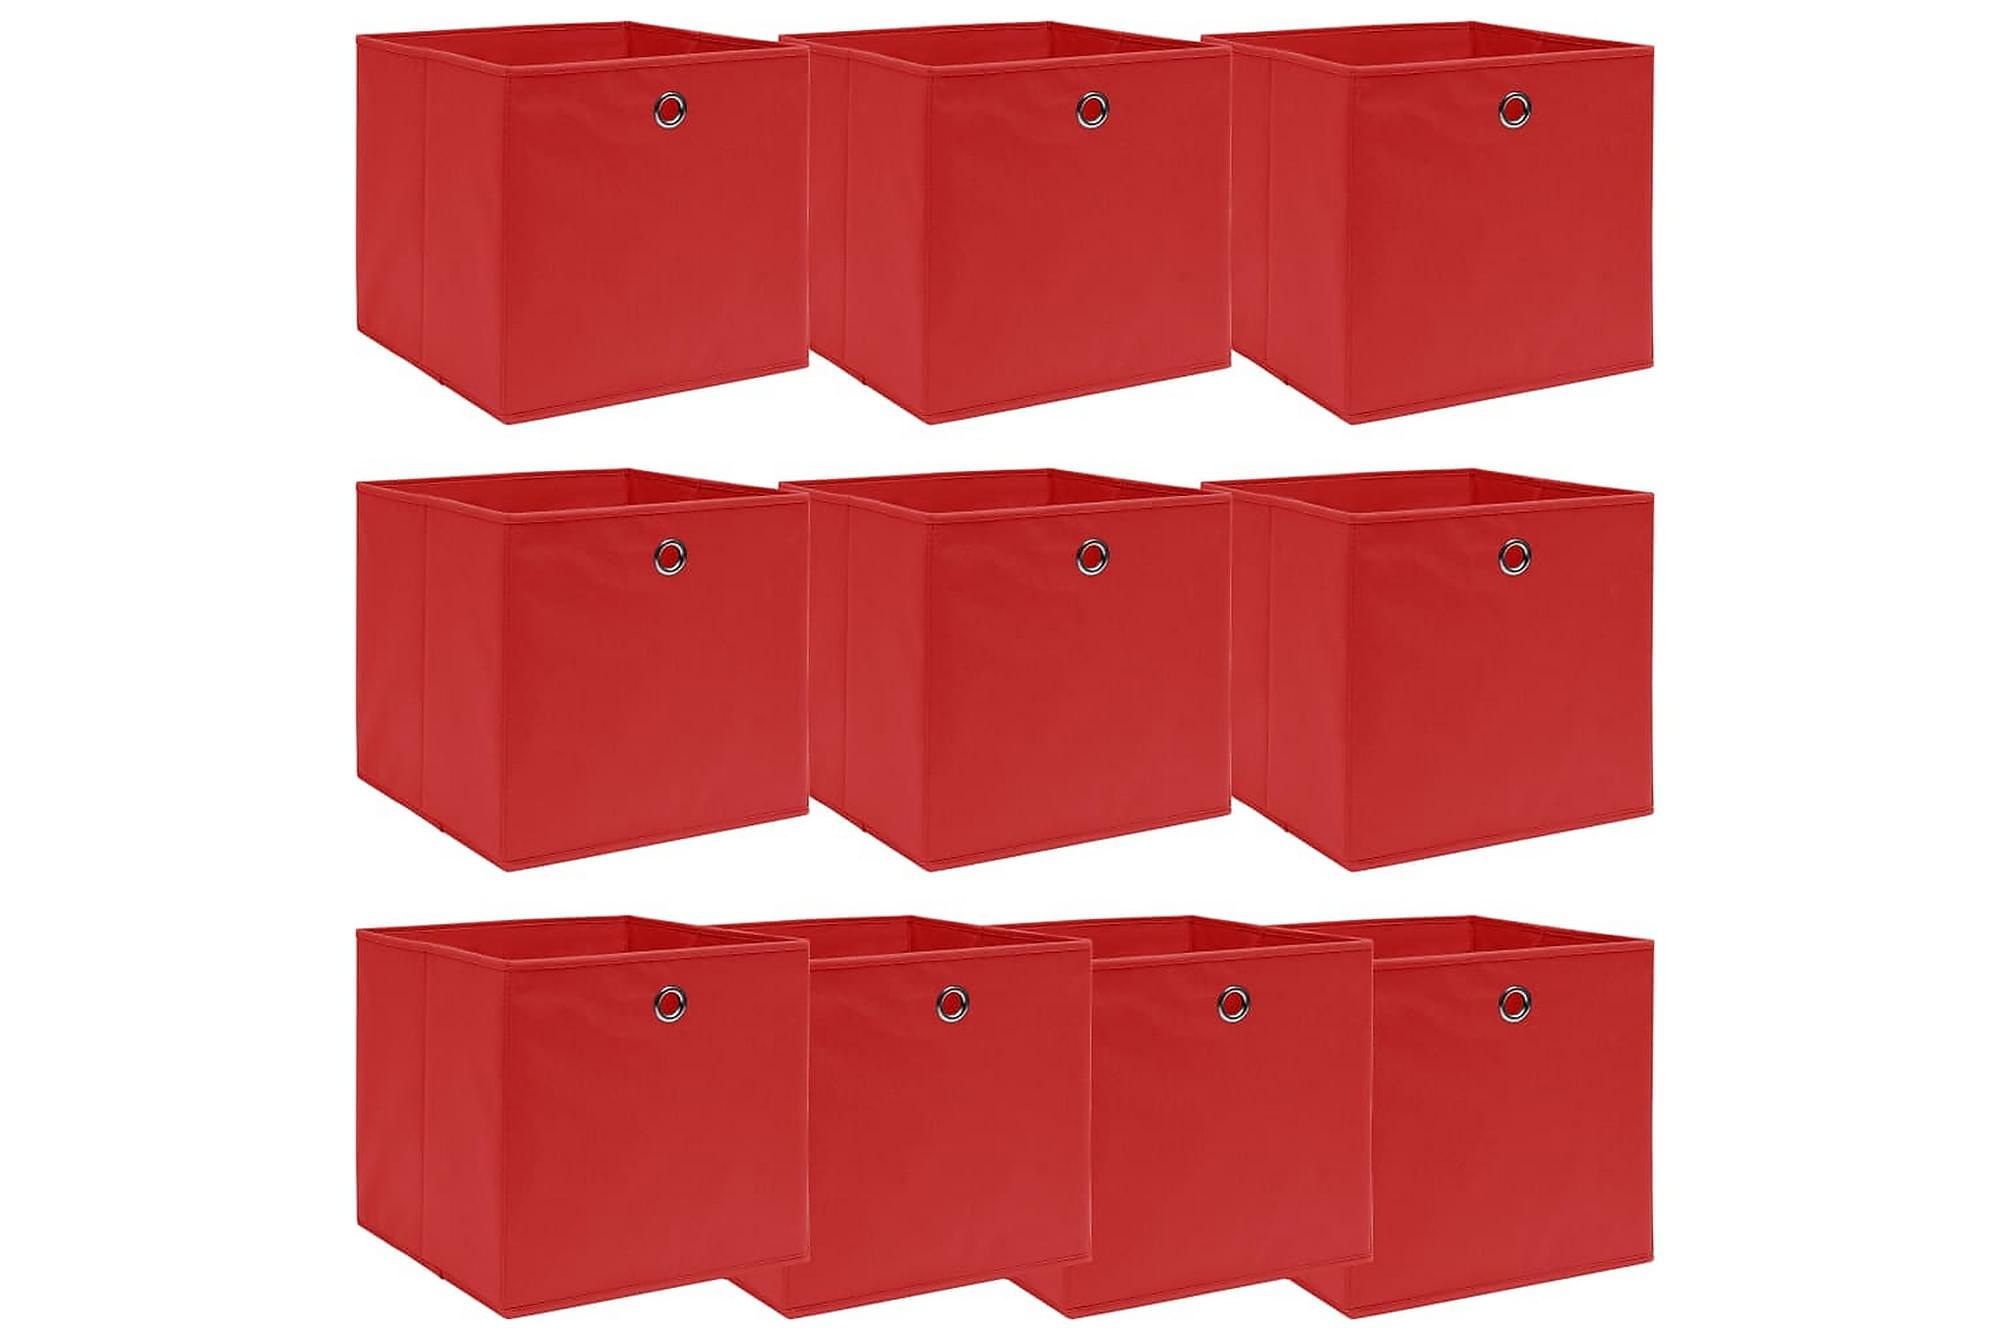 Förvaringslådor 10 st röd 32x32x32 cm tyg, Förvaringslådor & korgar